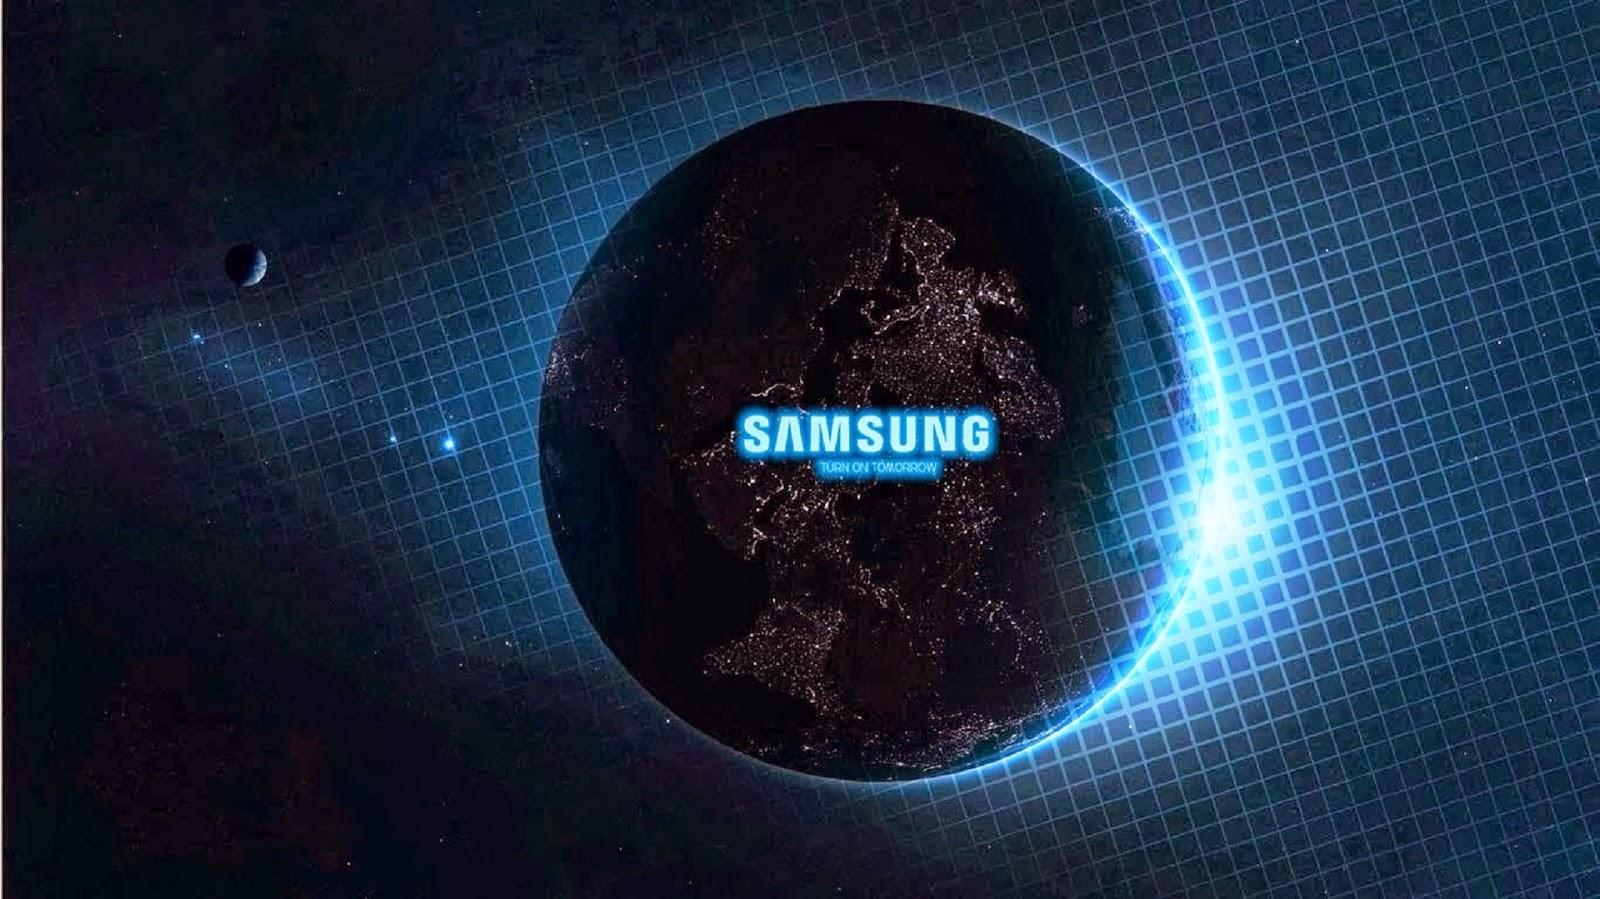 Hd wallpaper samsung - Samsung Logo Hd Wallpapers Wullus